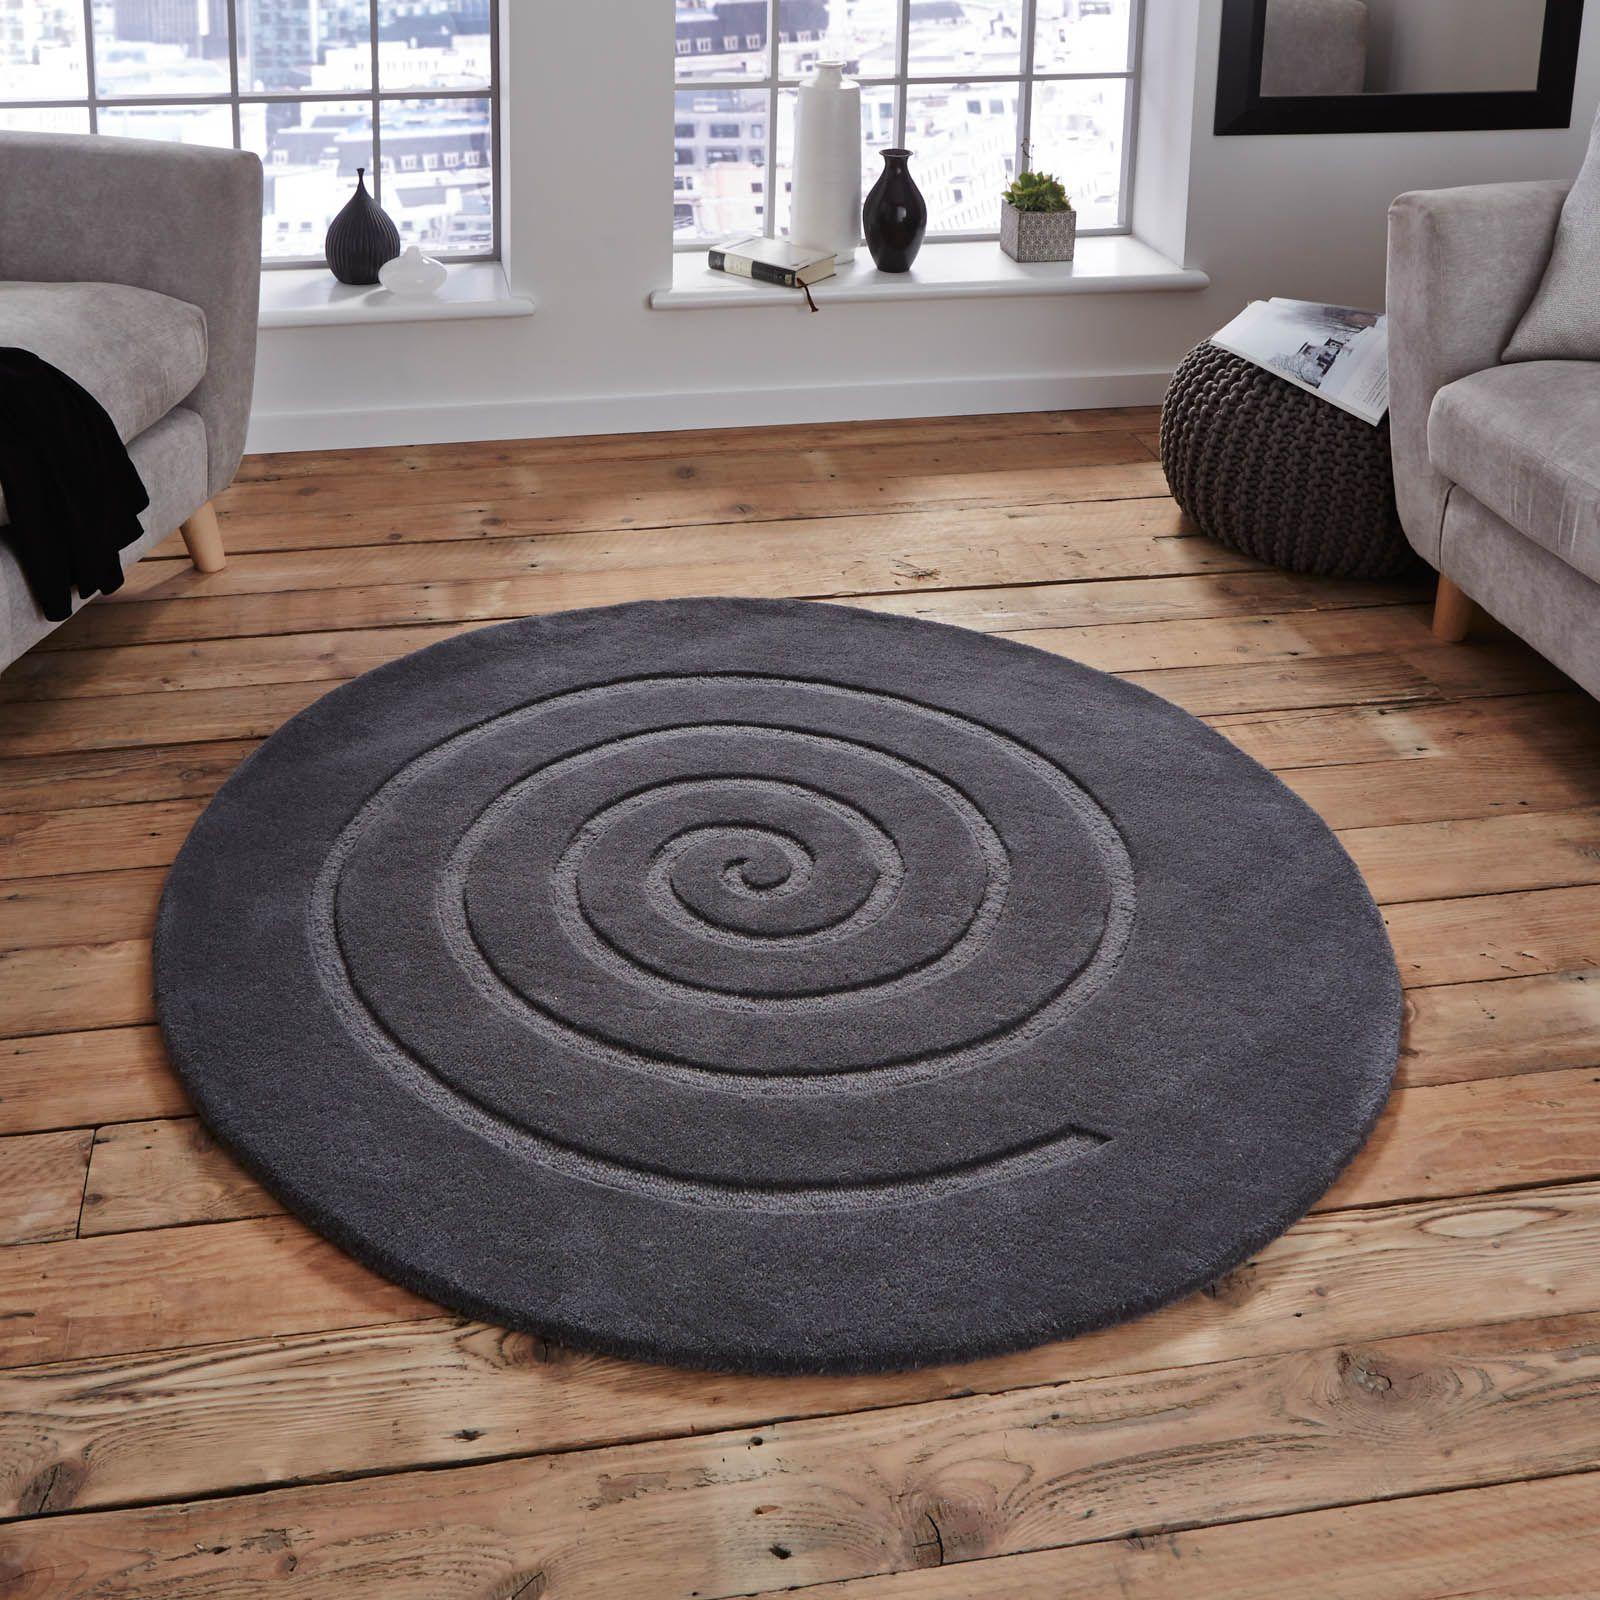 Spiral Circular Wool Rugs In Grey